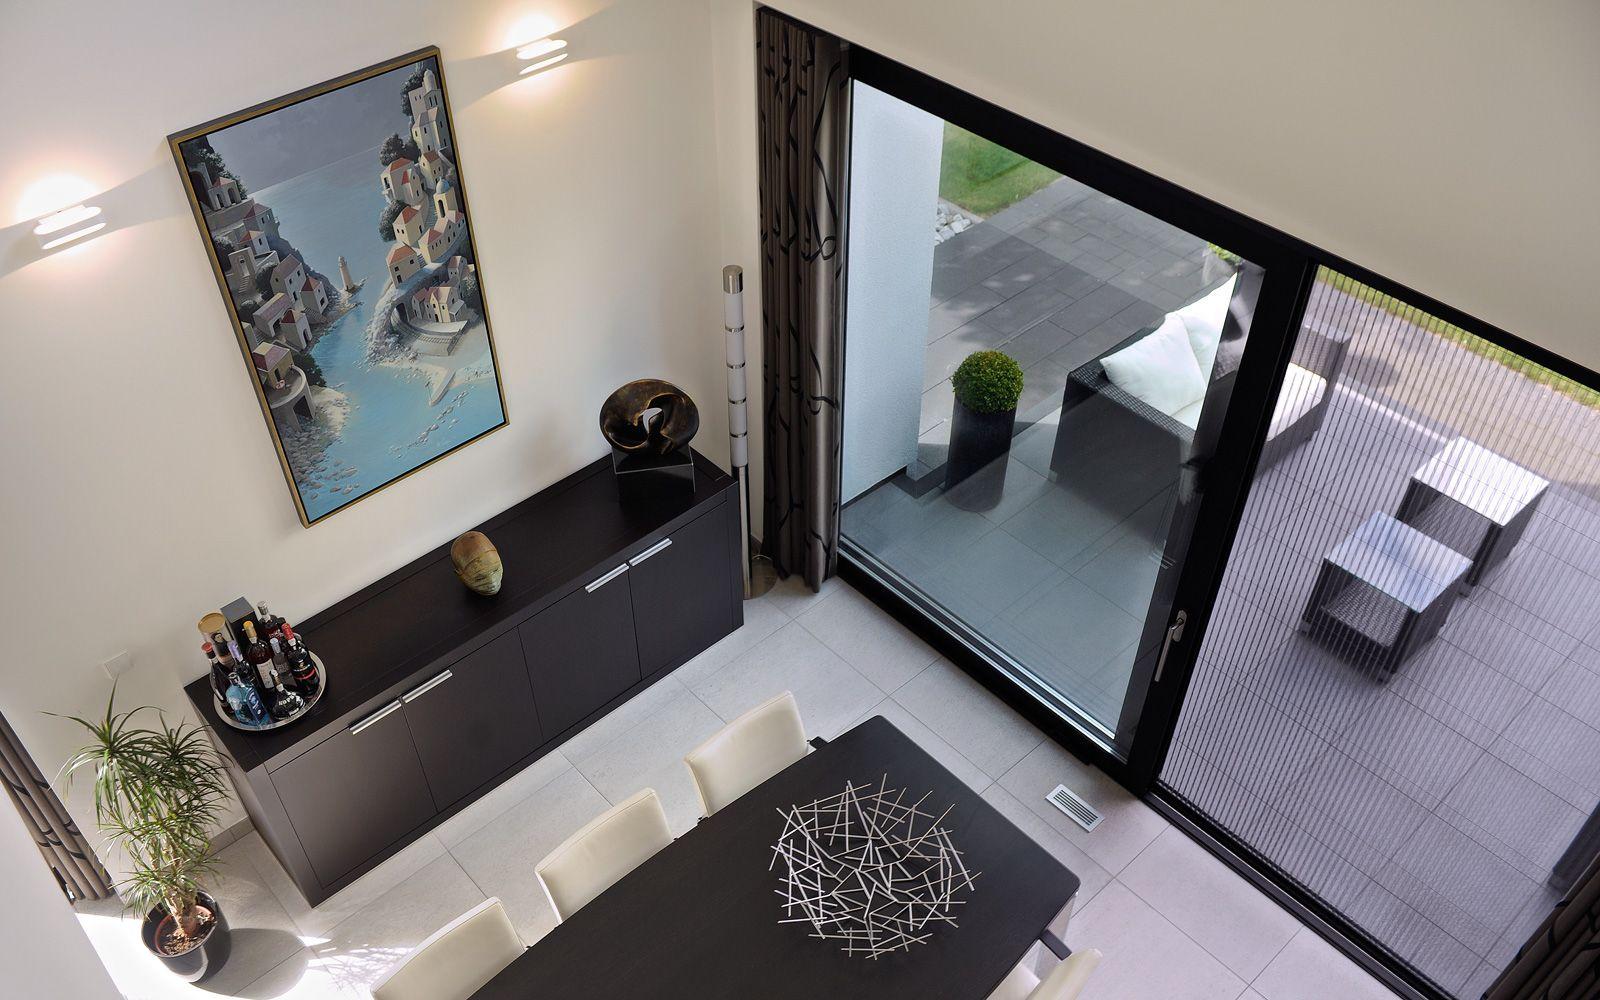 Museale woning eetkamer pinterest for Moderne binnenhuisarchitectuur